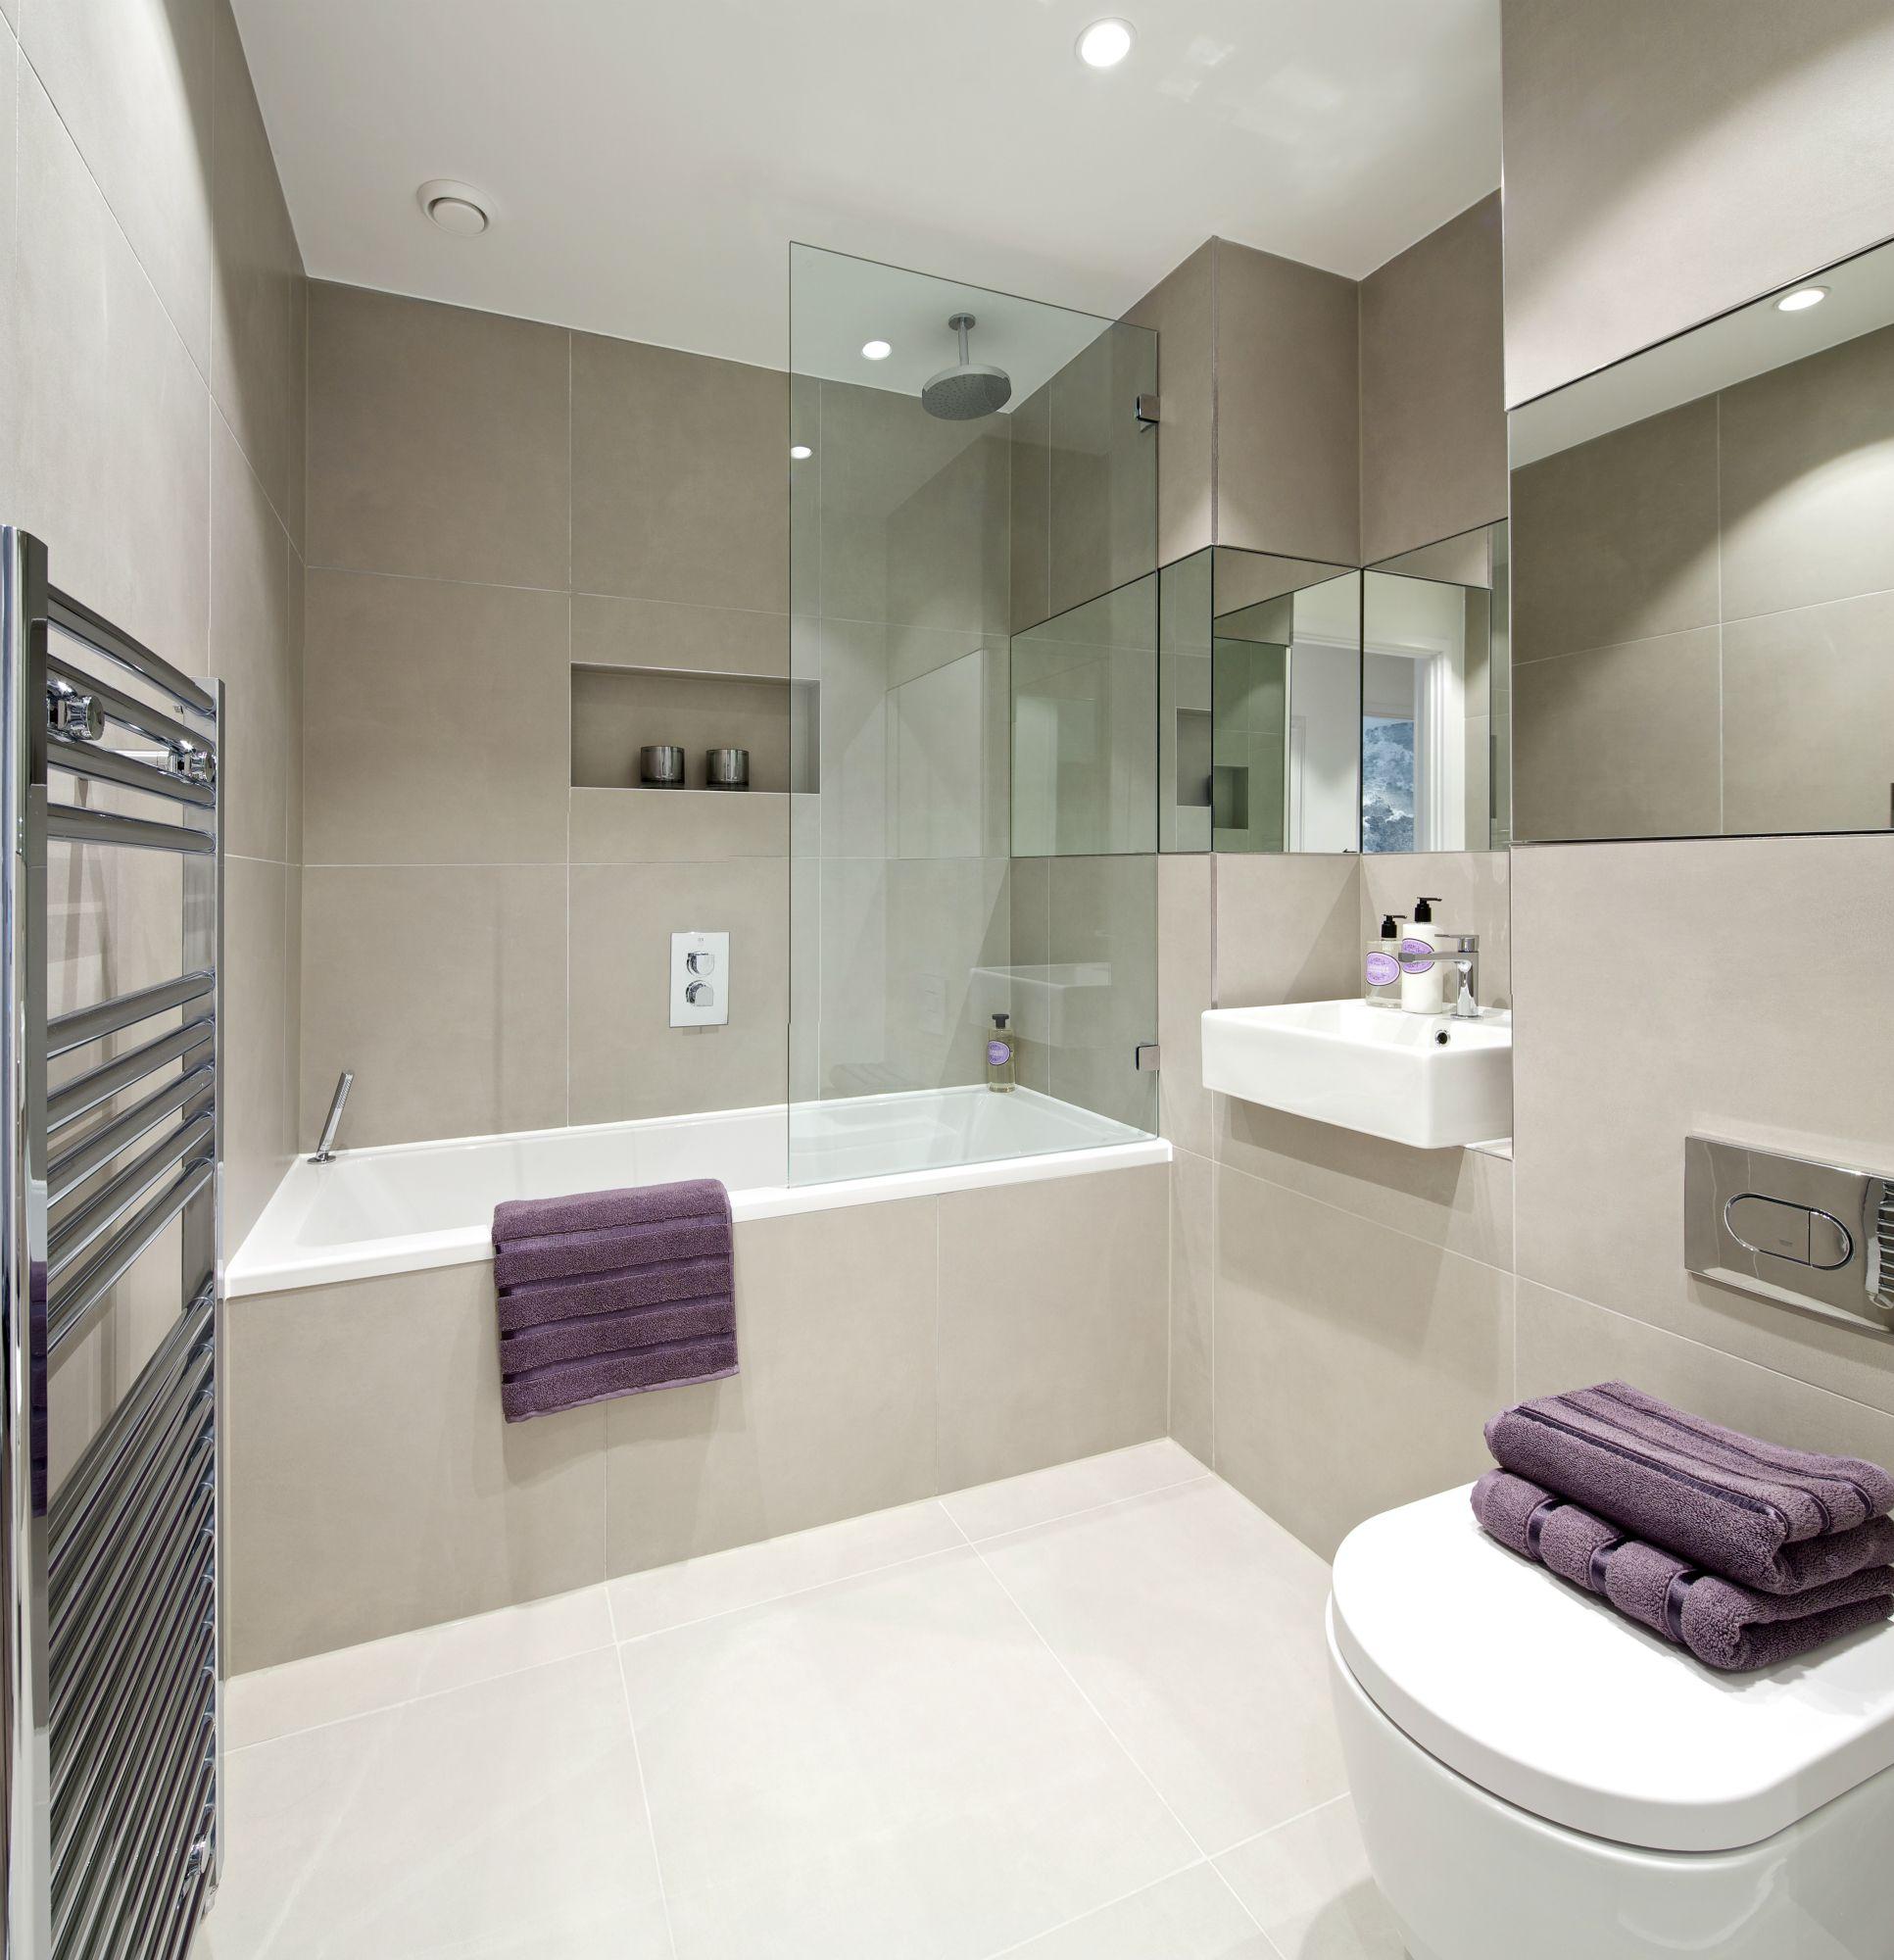 stunning home interiors  Bathroom  Another Stunning Show Home Design By Suna Interior Design